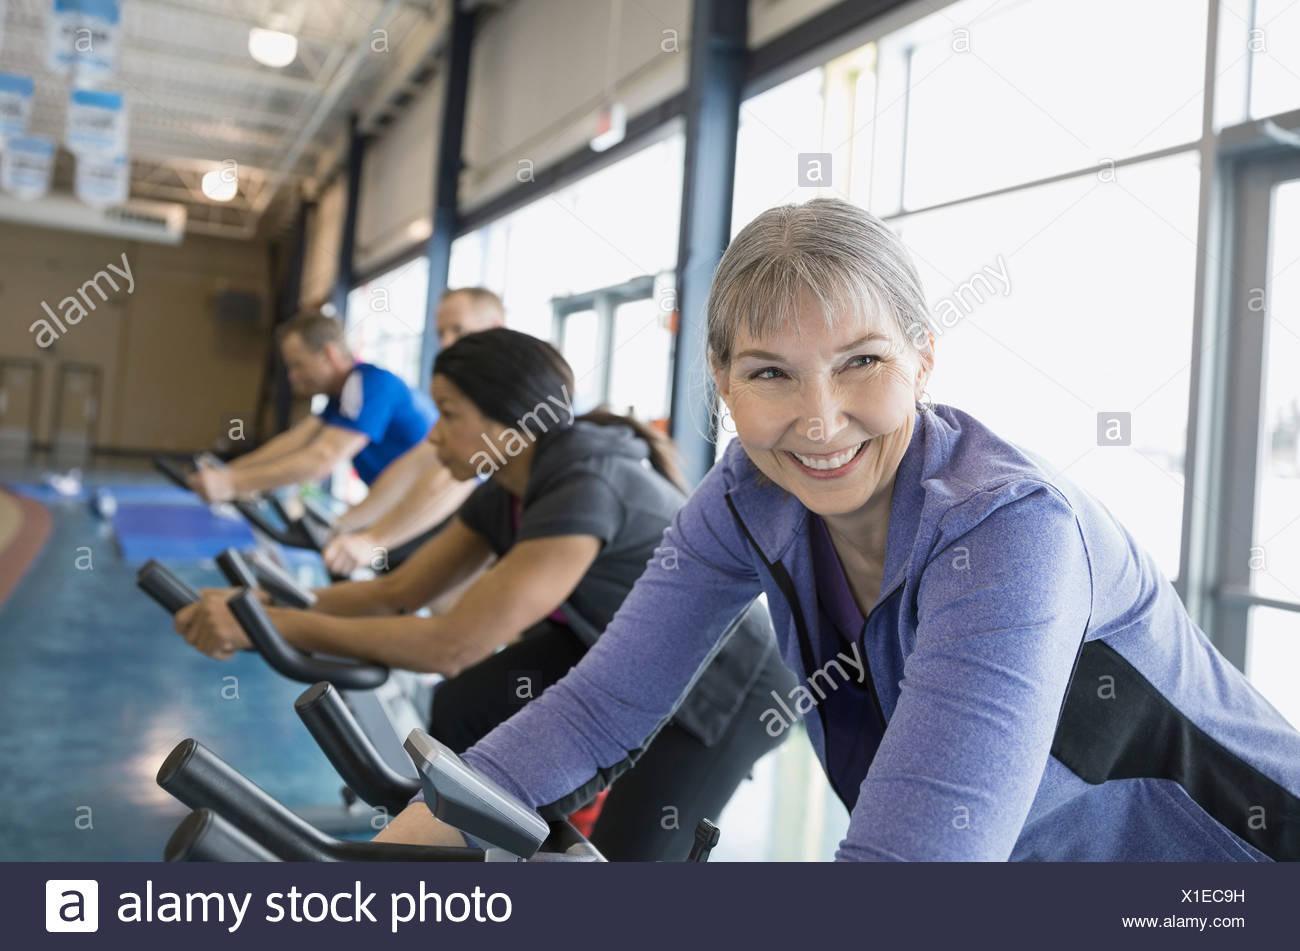 Smiling woman on exercise bike - Stock Image